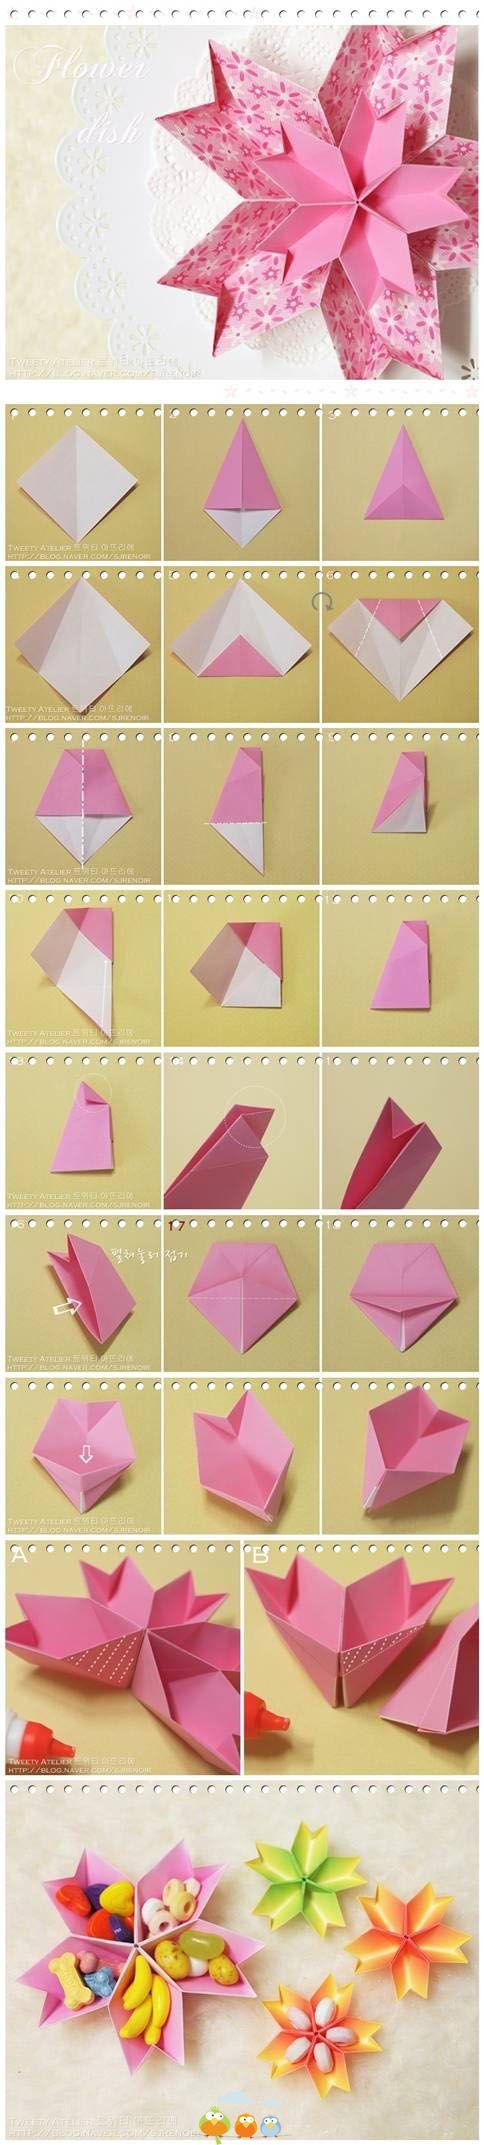 Geometric Origami Bowl Instructions | Boite | 2145x484